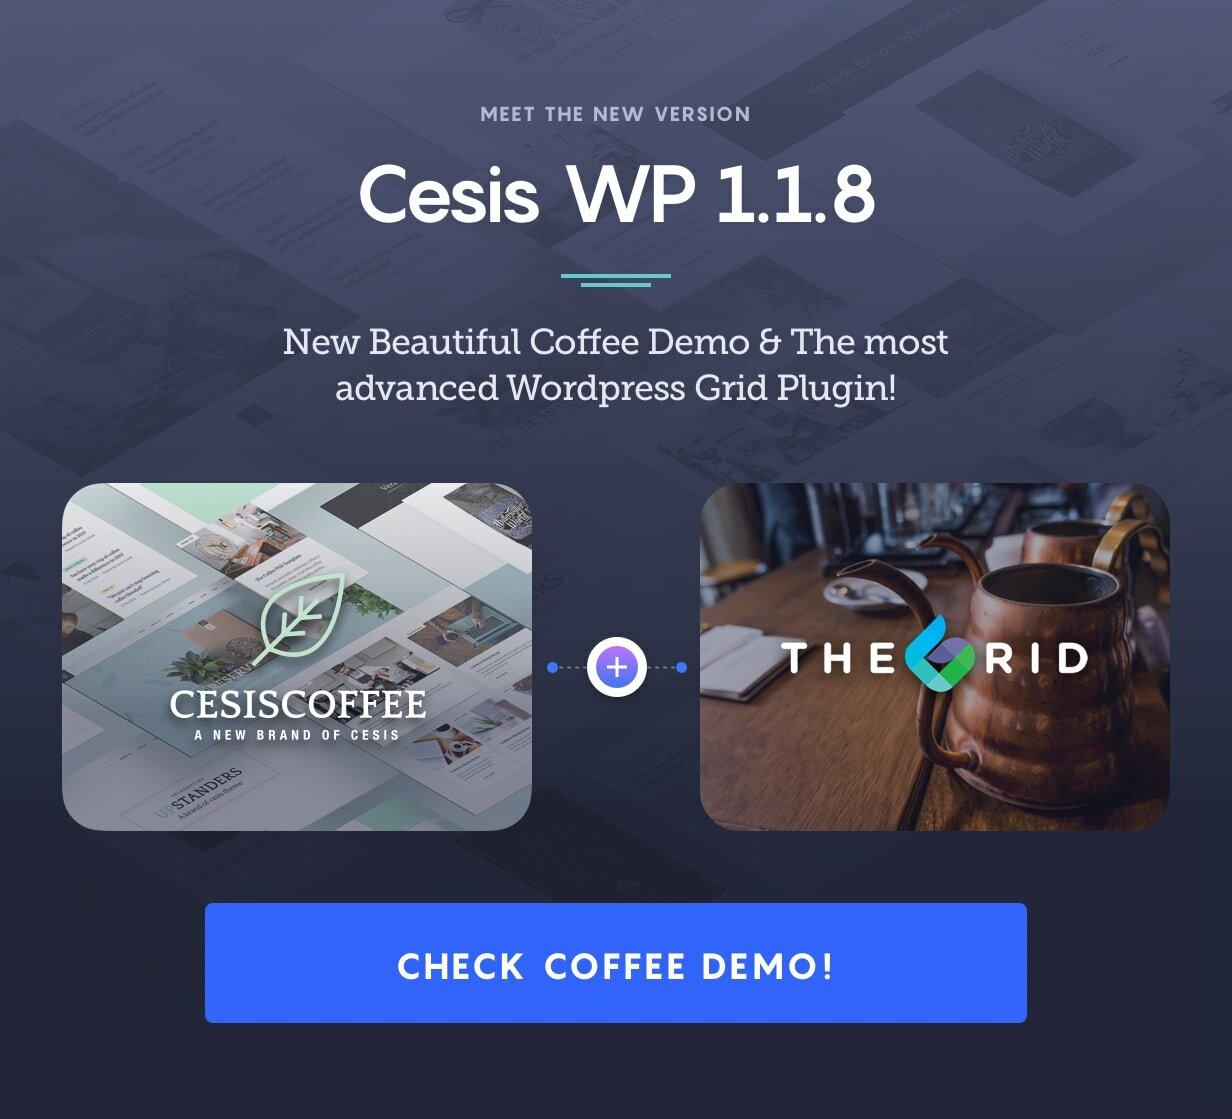 Cesis WordPress ver 1.1.7 - Coffee Demo added